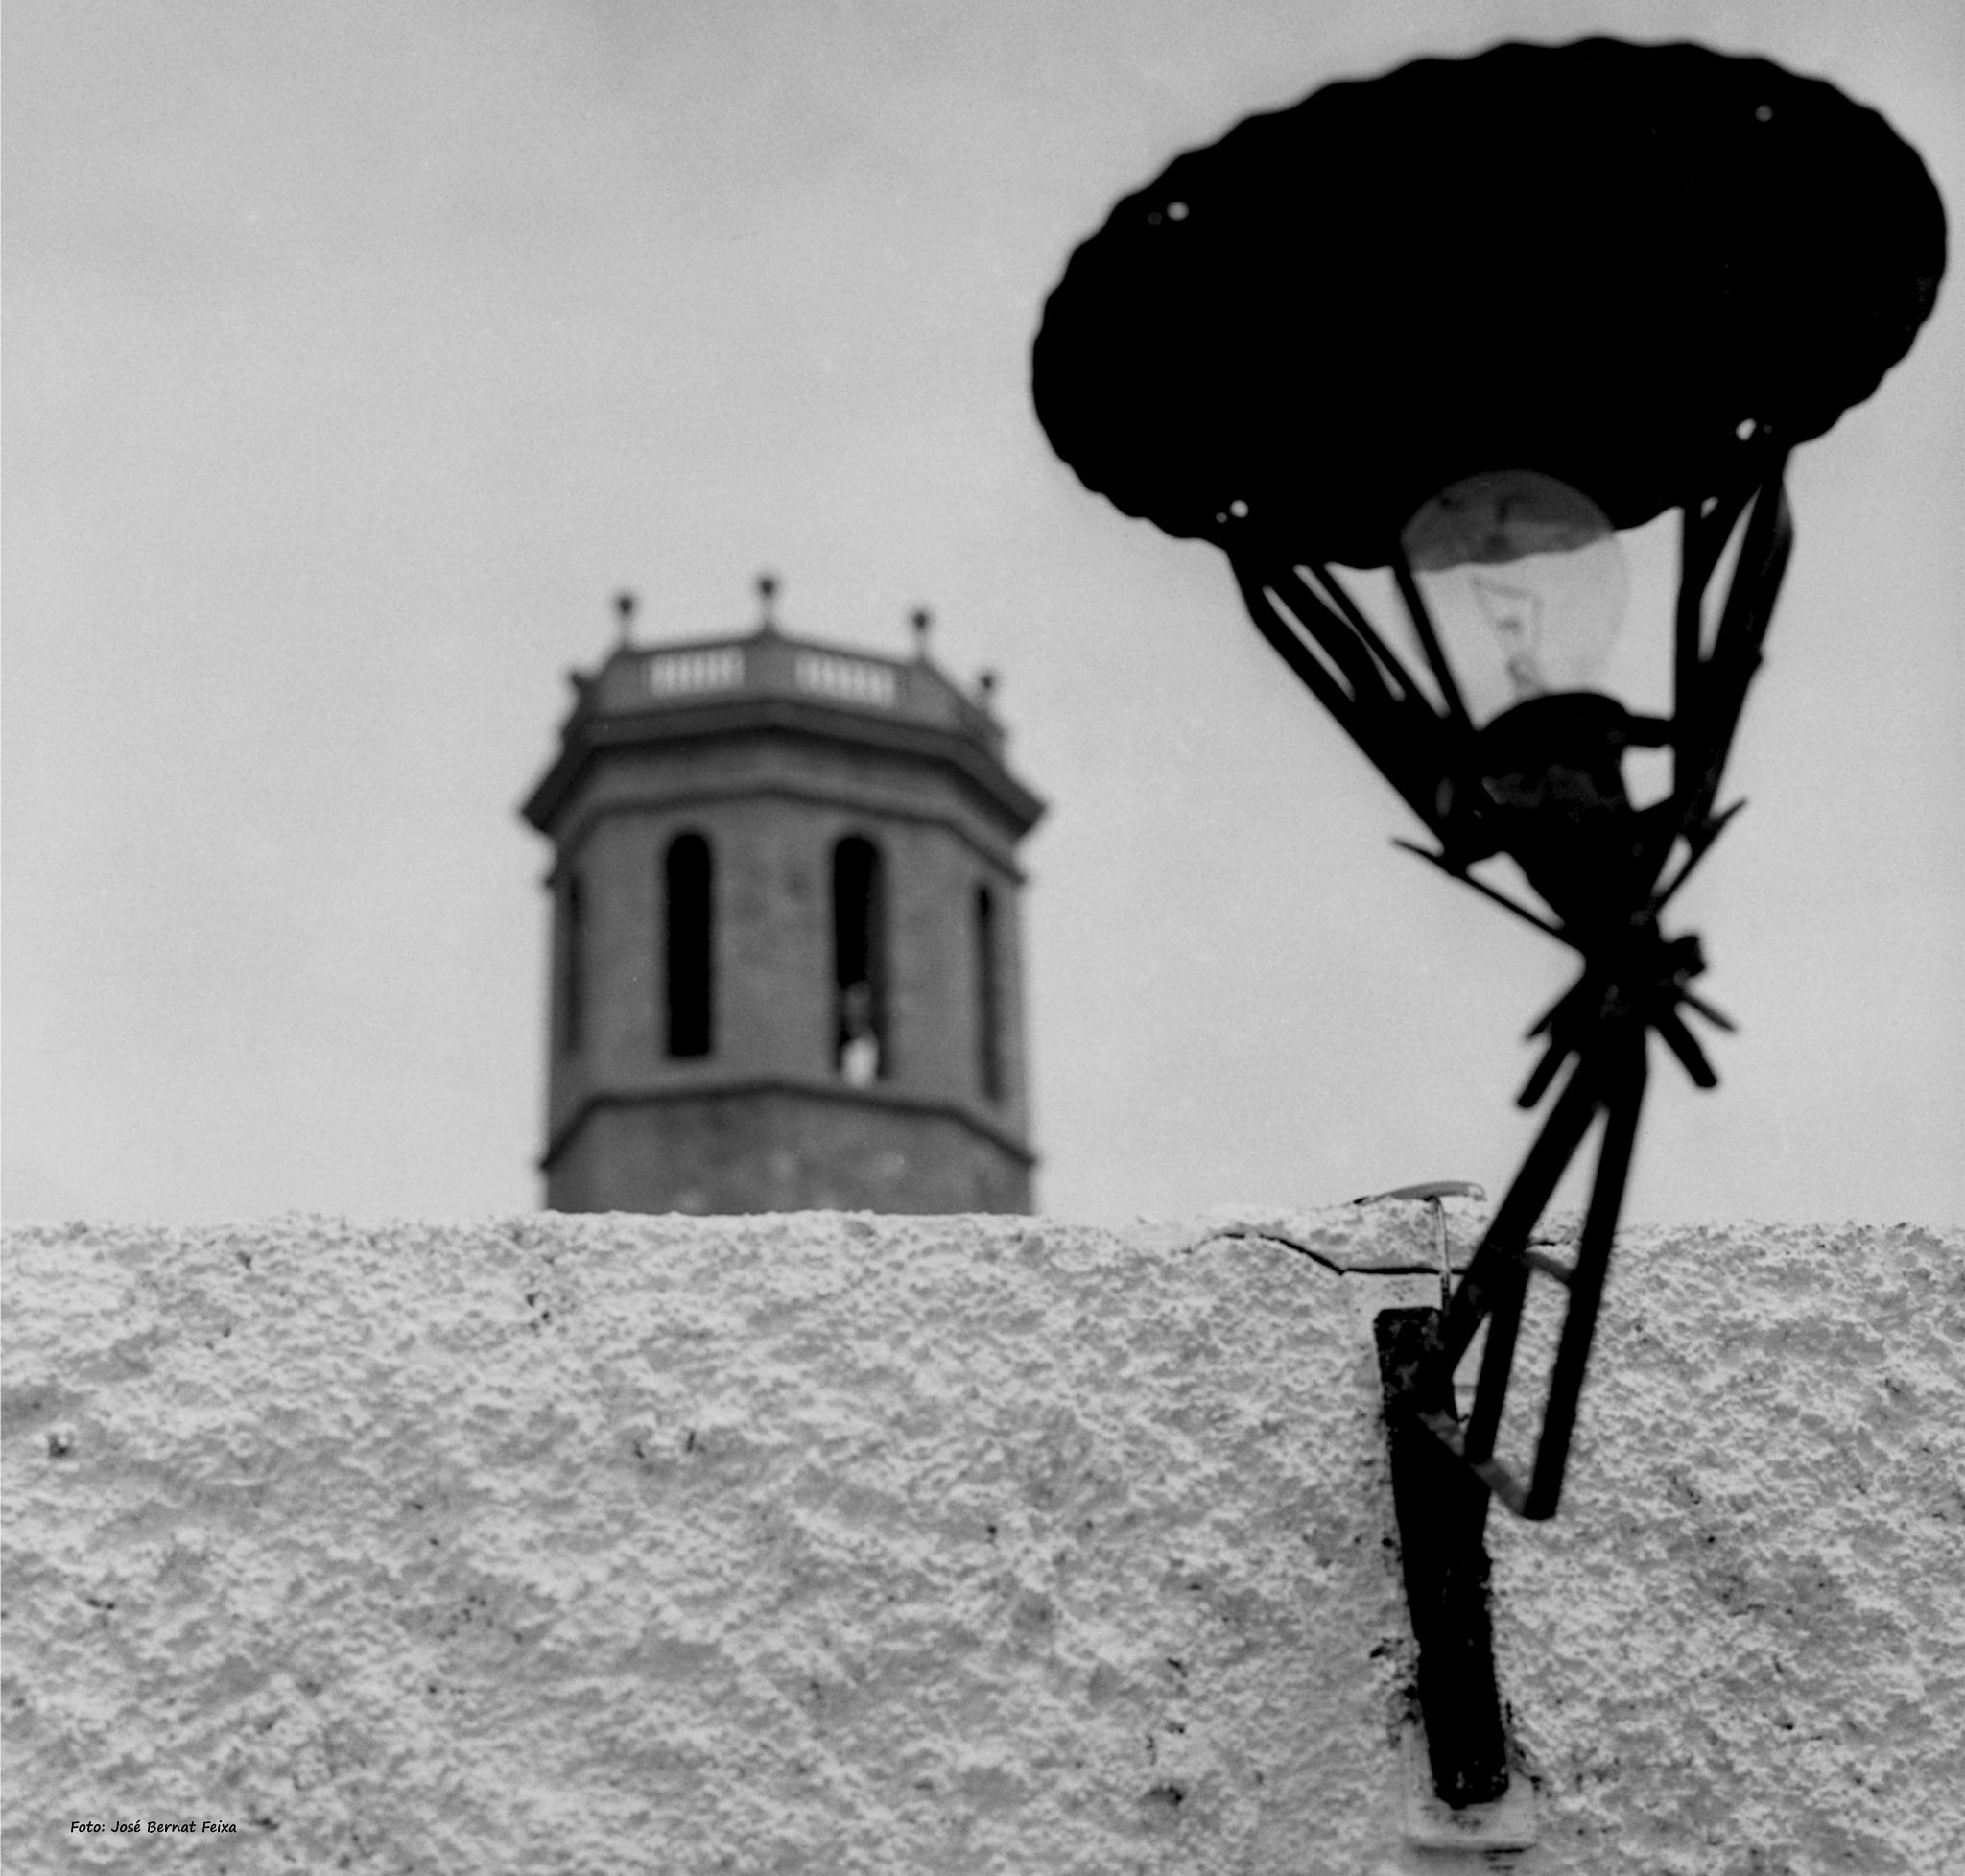 LÁMPARA Y TORRE; LAMP EN TOREN; LAMP AND TOWER (60's) by José Bernat Feixa